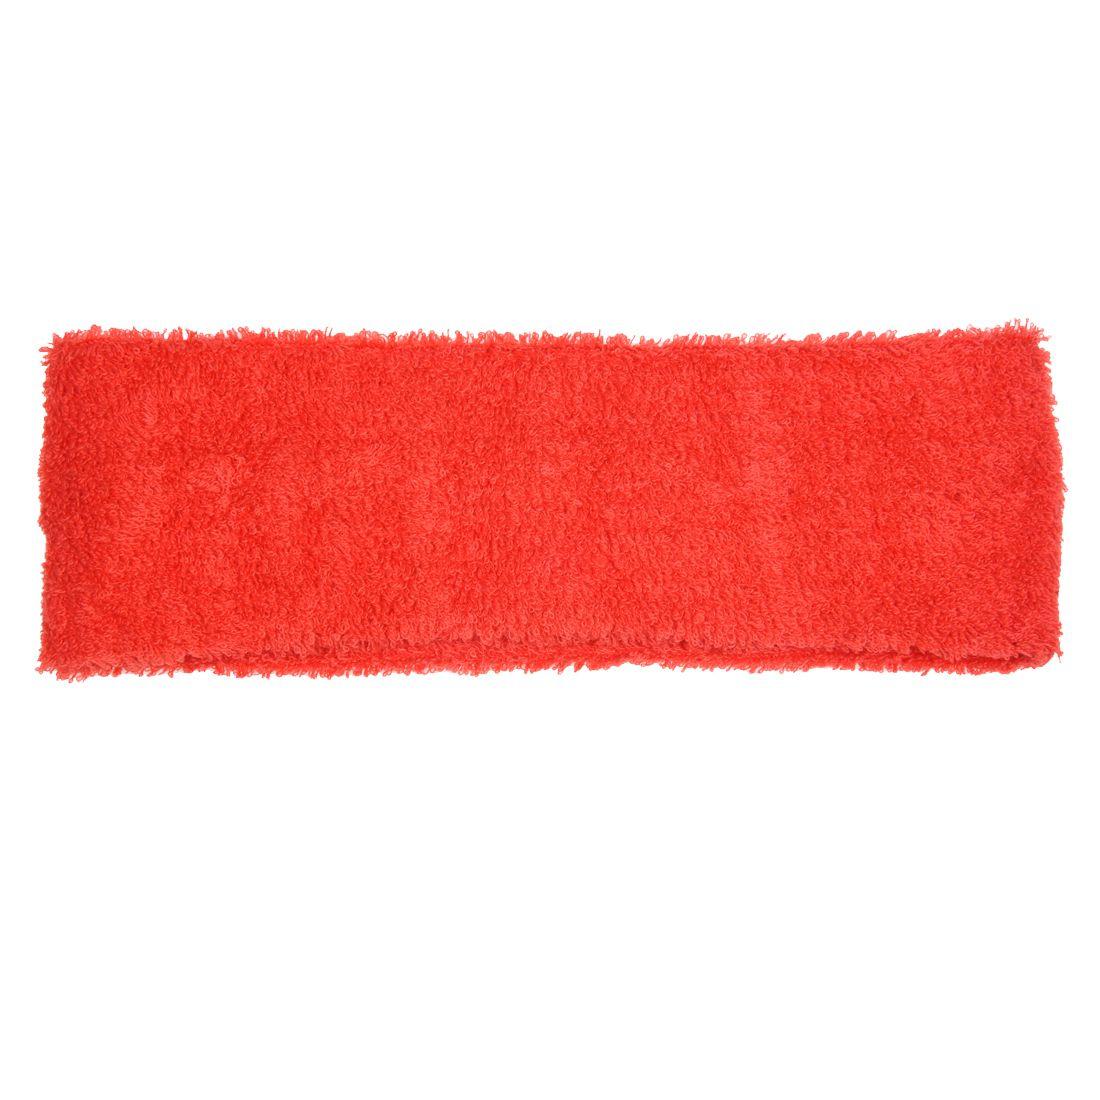 Hair Headband sweatband Stretchy band women / men in red